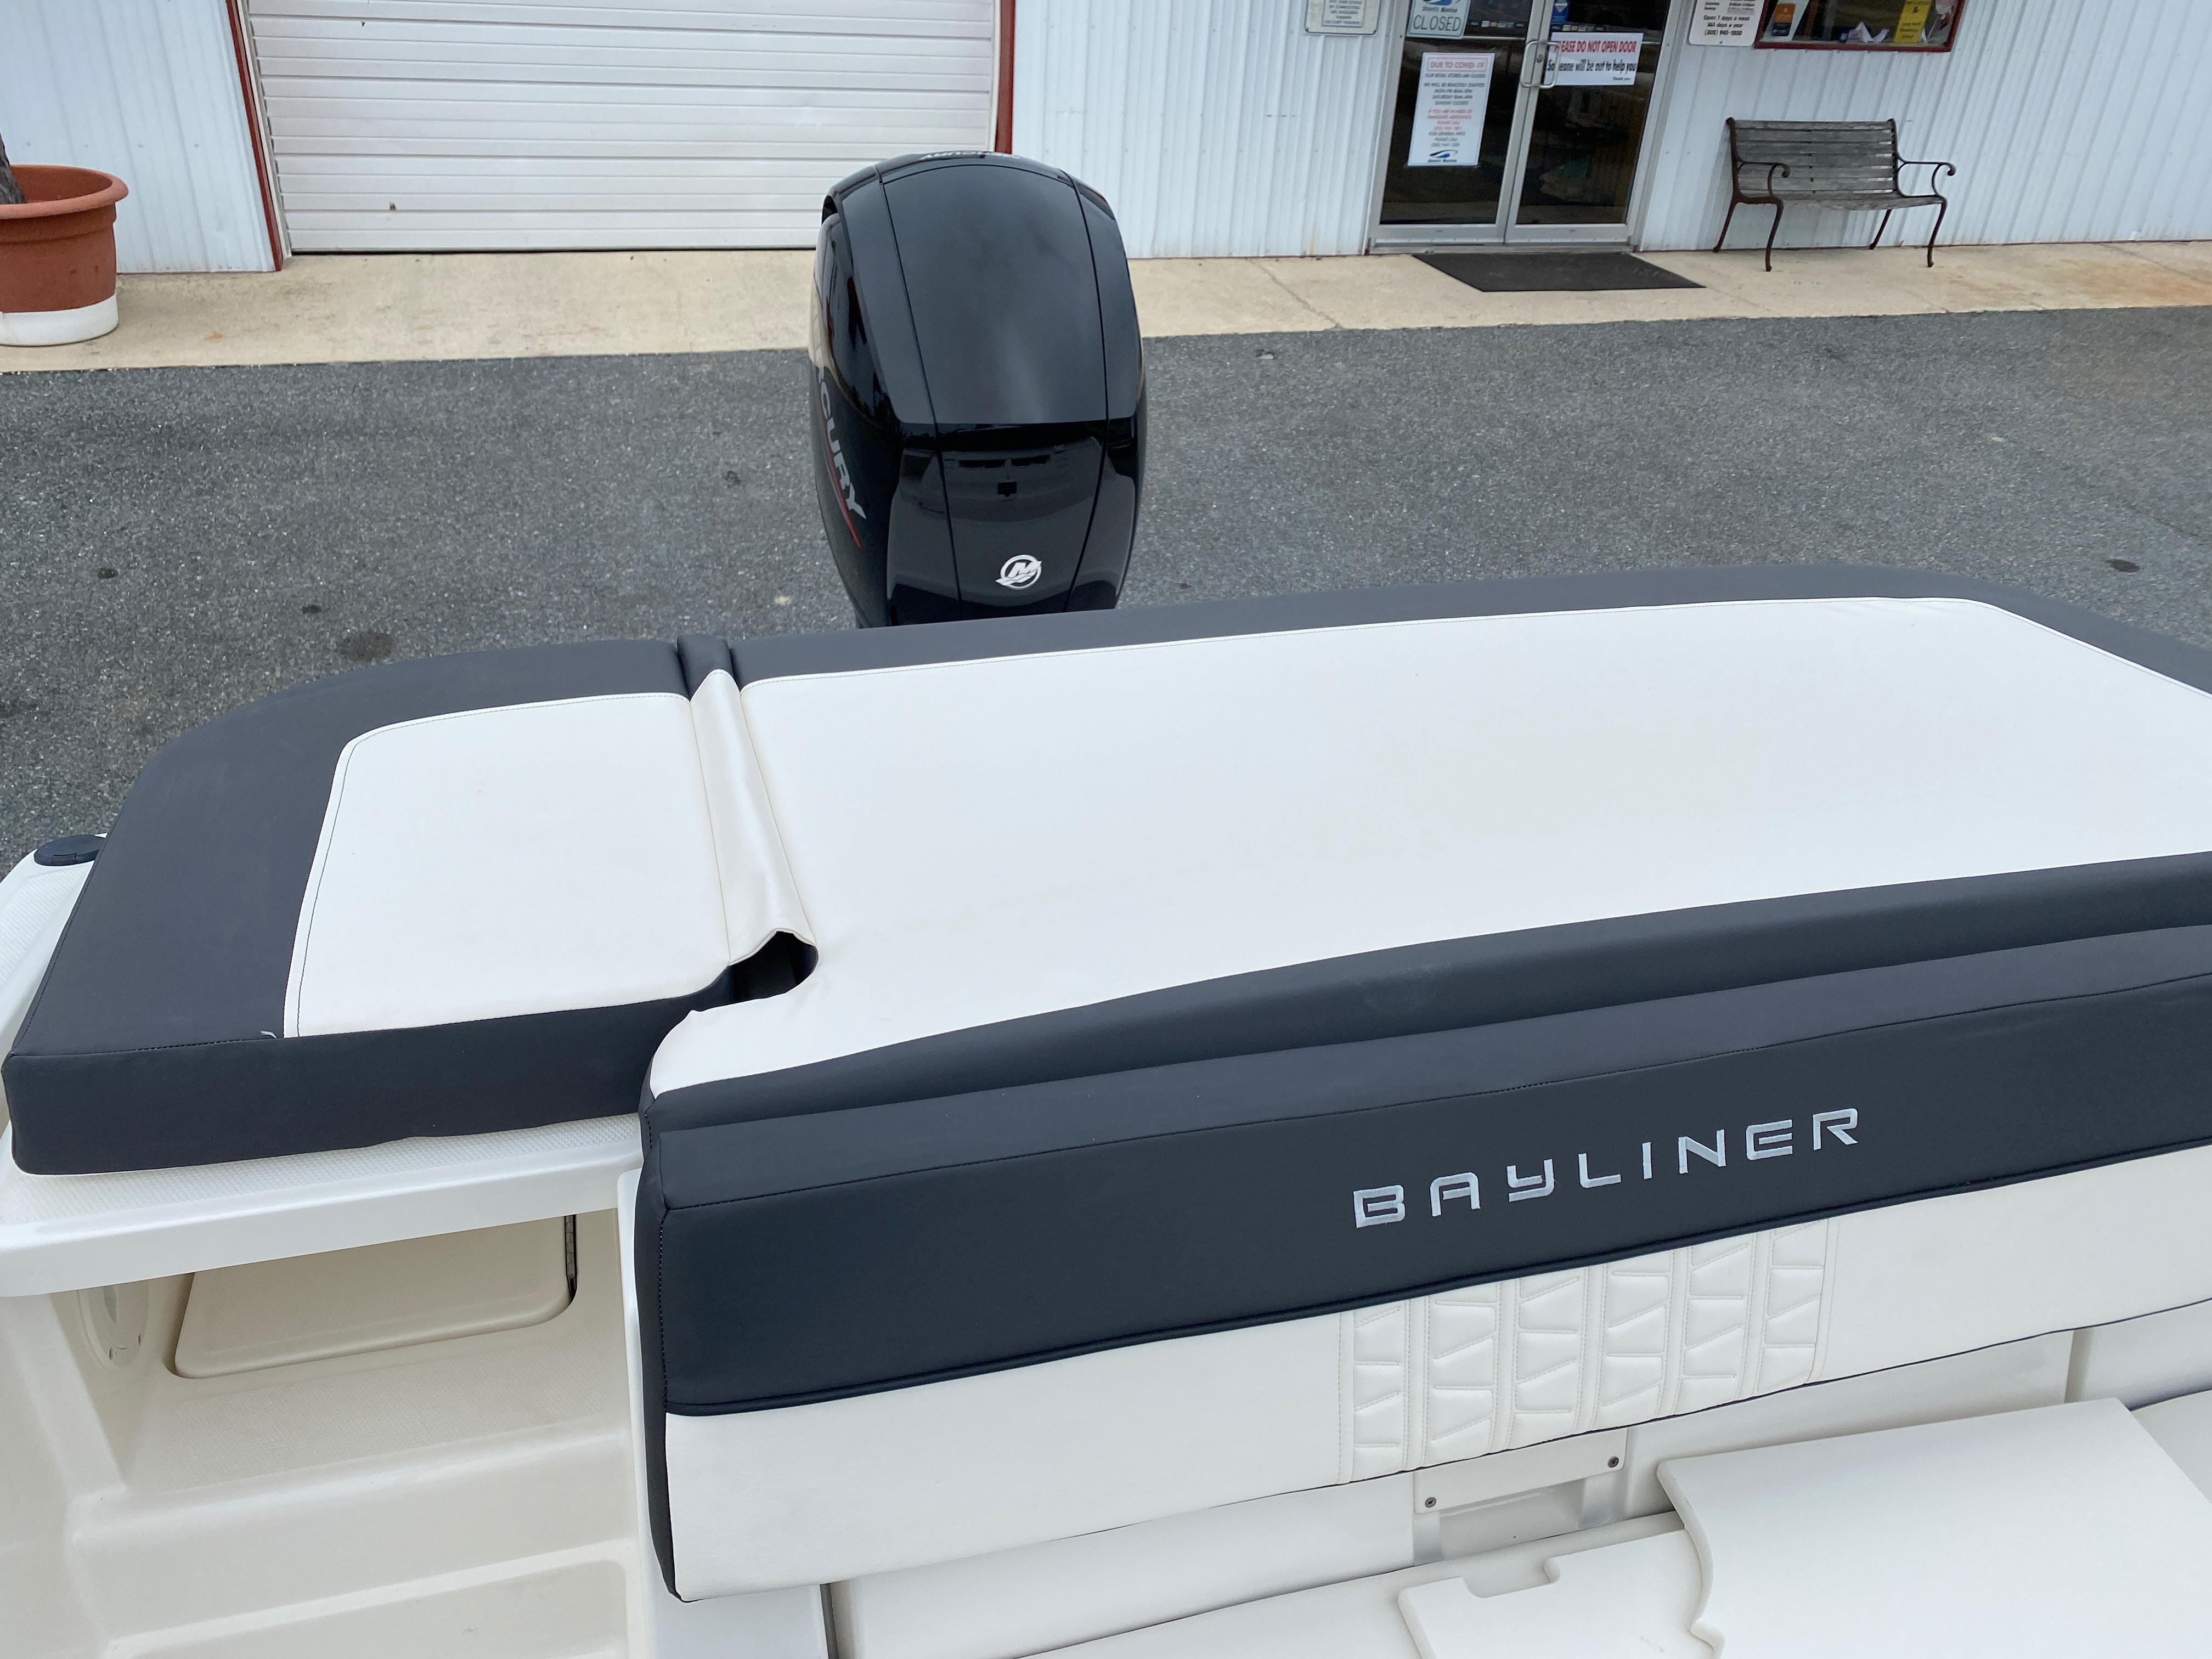 2020 Bayliner boat for sale, model of the boat is VR6 Bowrider & Image # 9 of 14